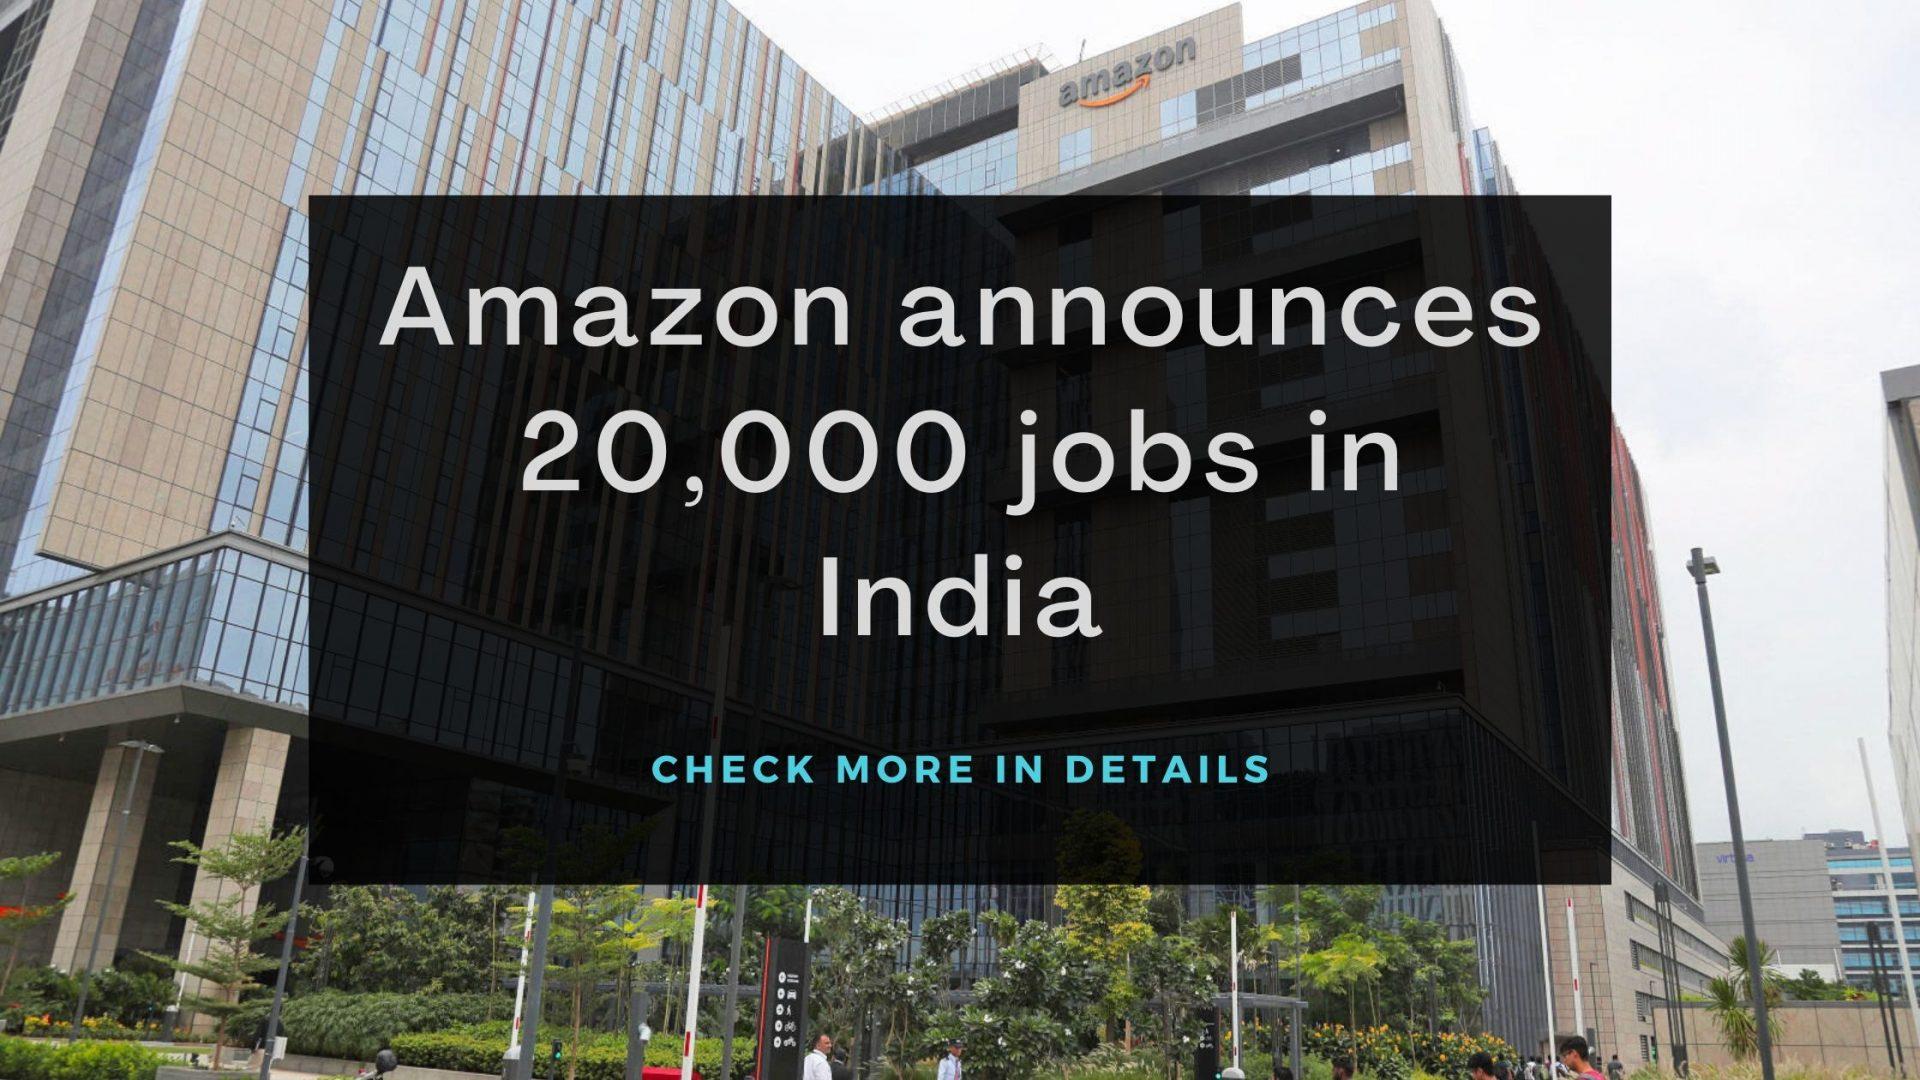 Amazon announces 20,000 jobs in India-thedigiweb